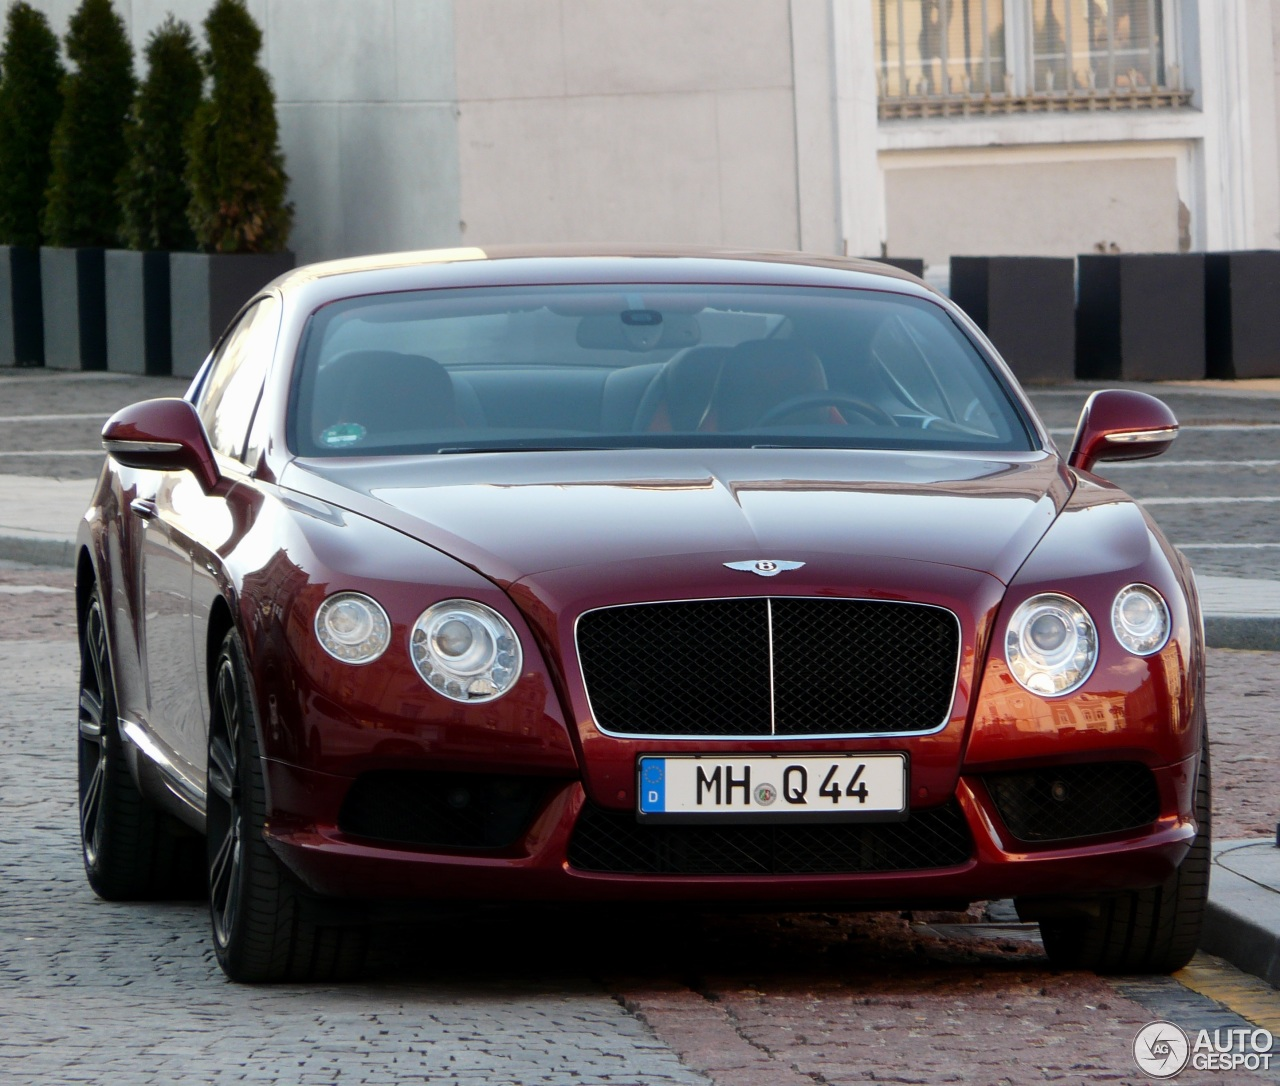 2019 Bentley Continental Gt Msrp: Bentley Continental GT V8